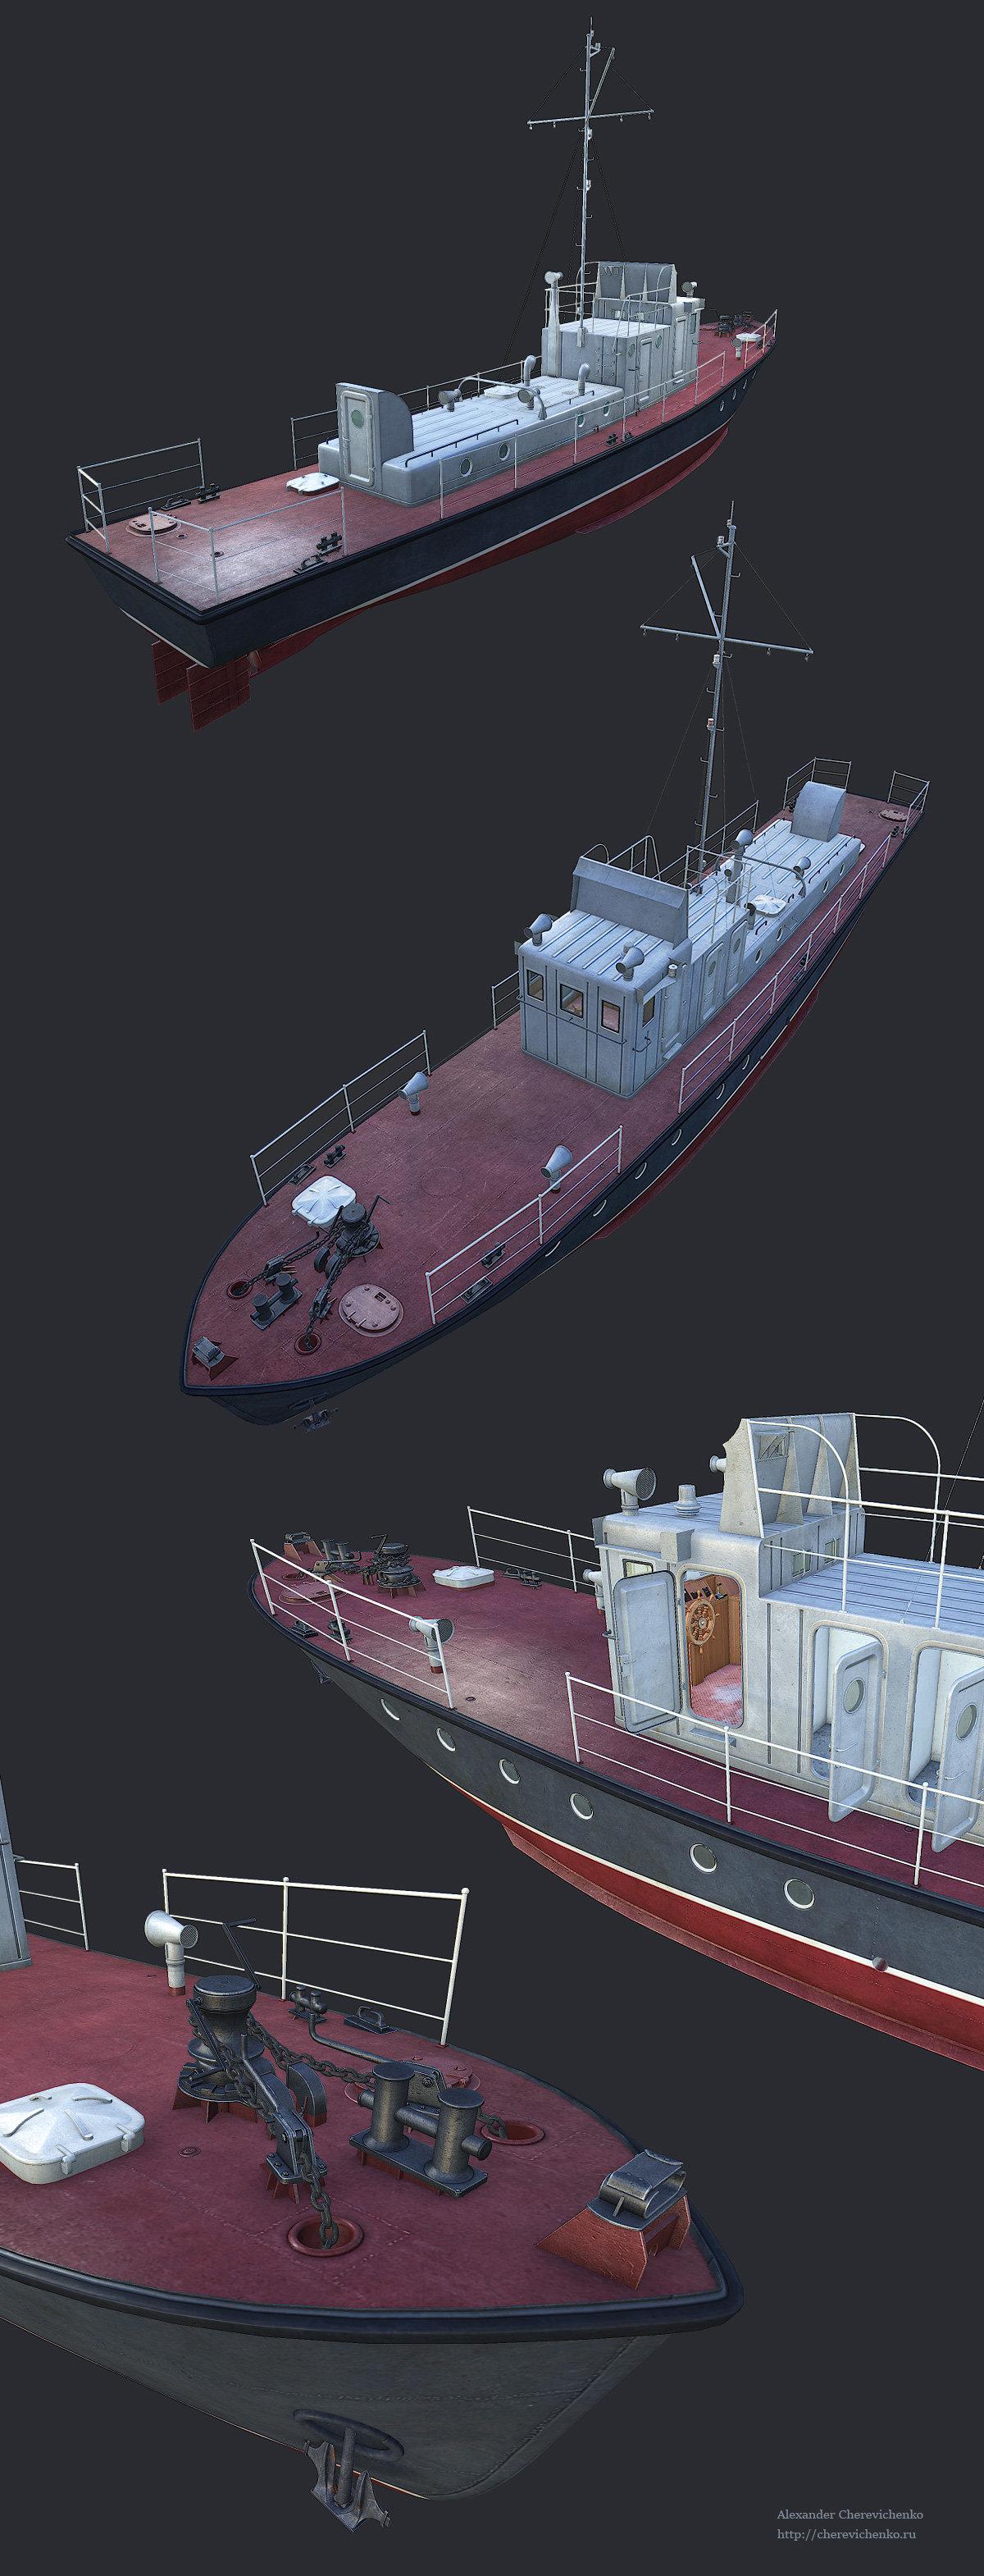 alexander-cherevichenko-boat-yaroslavets-376y-03.jpg